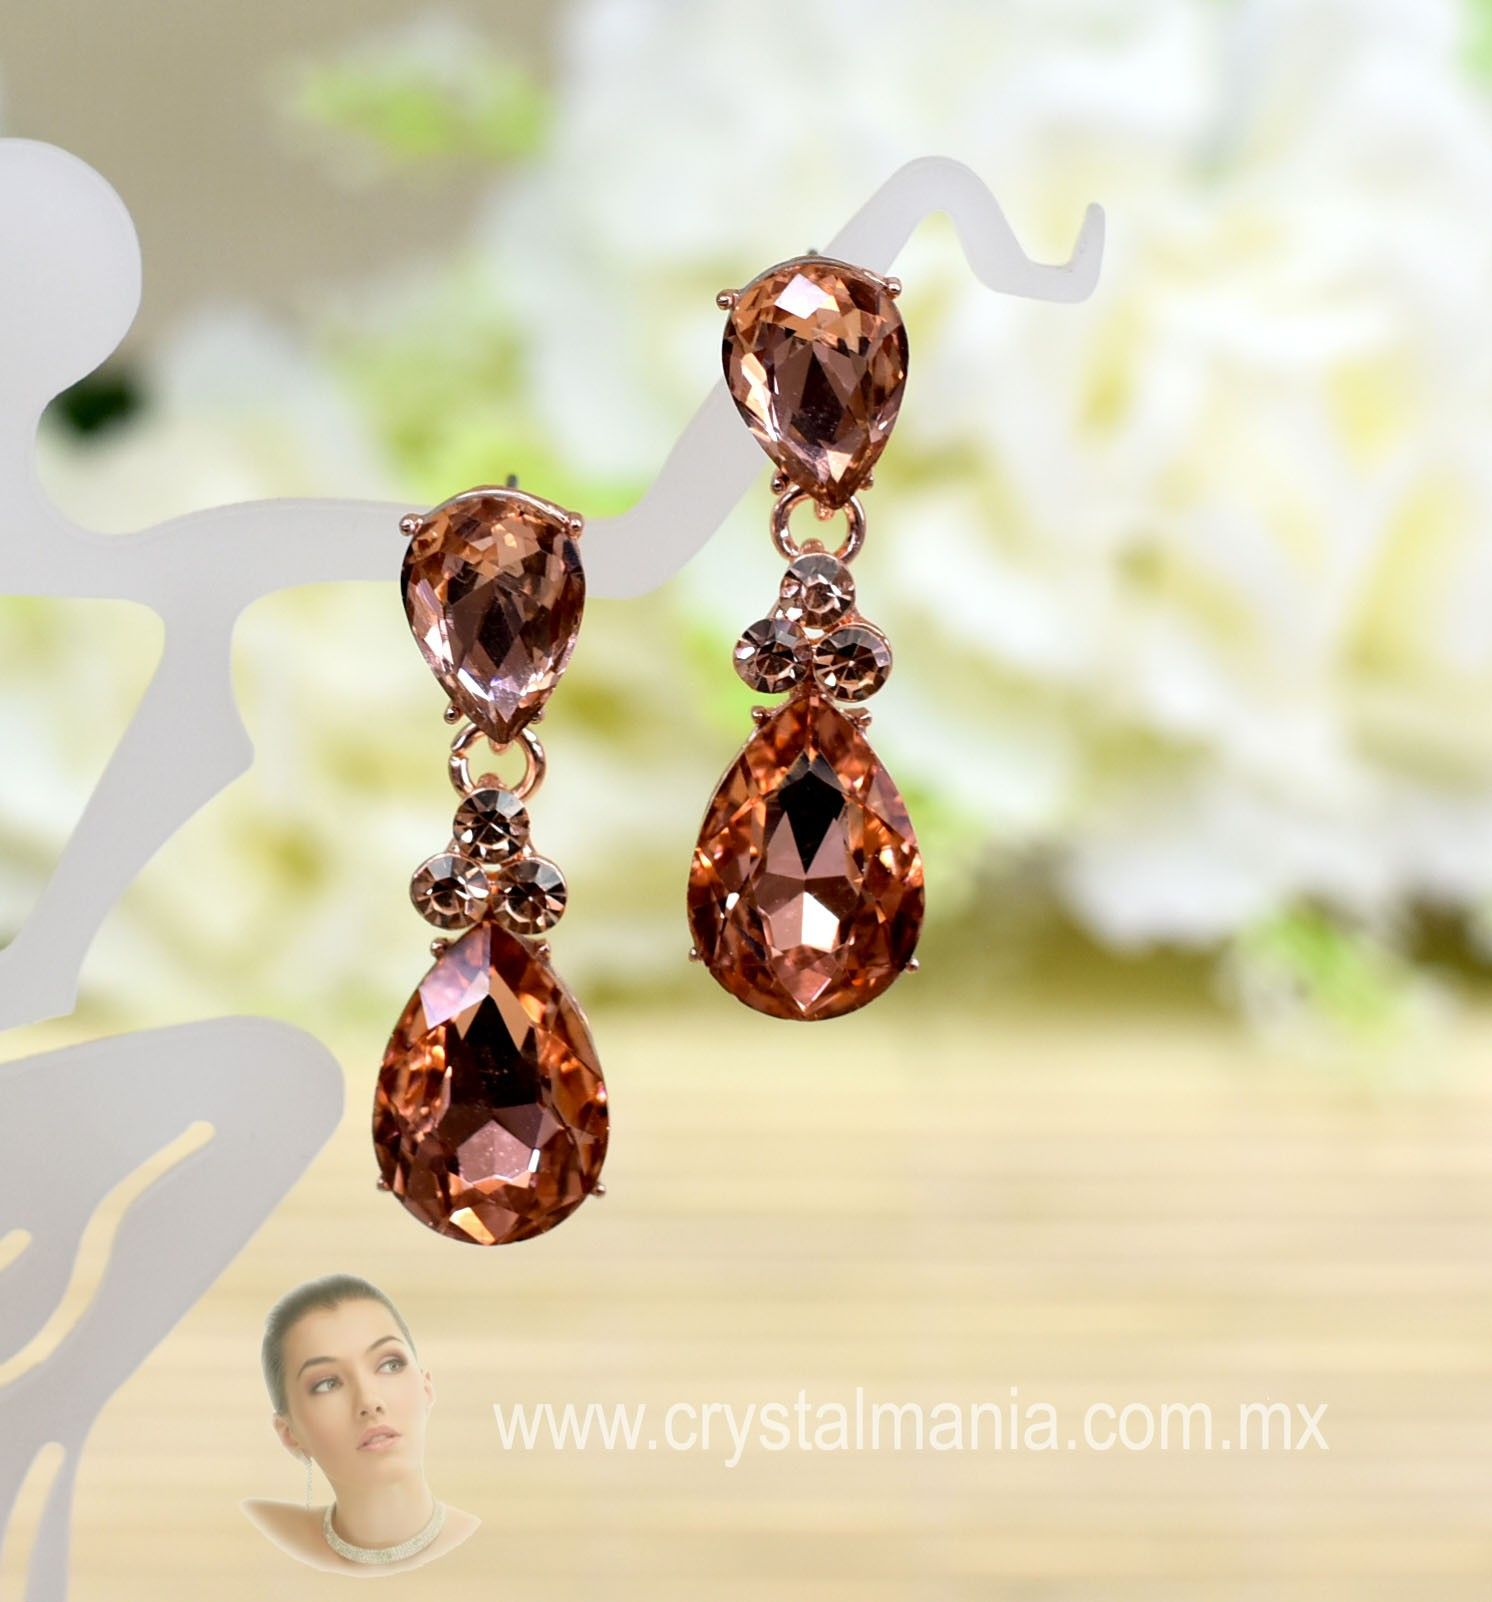 nuevo estilo a7367 4c7a4 Aretes bisuteria moda, aretes rose gold cristal, aretes ...